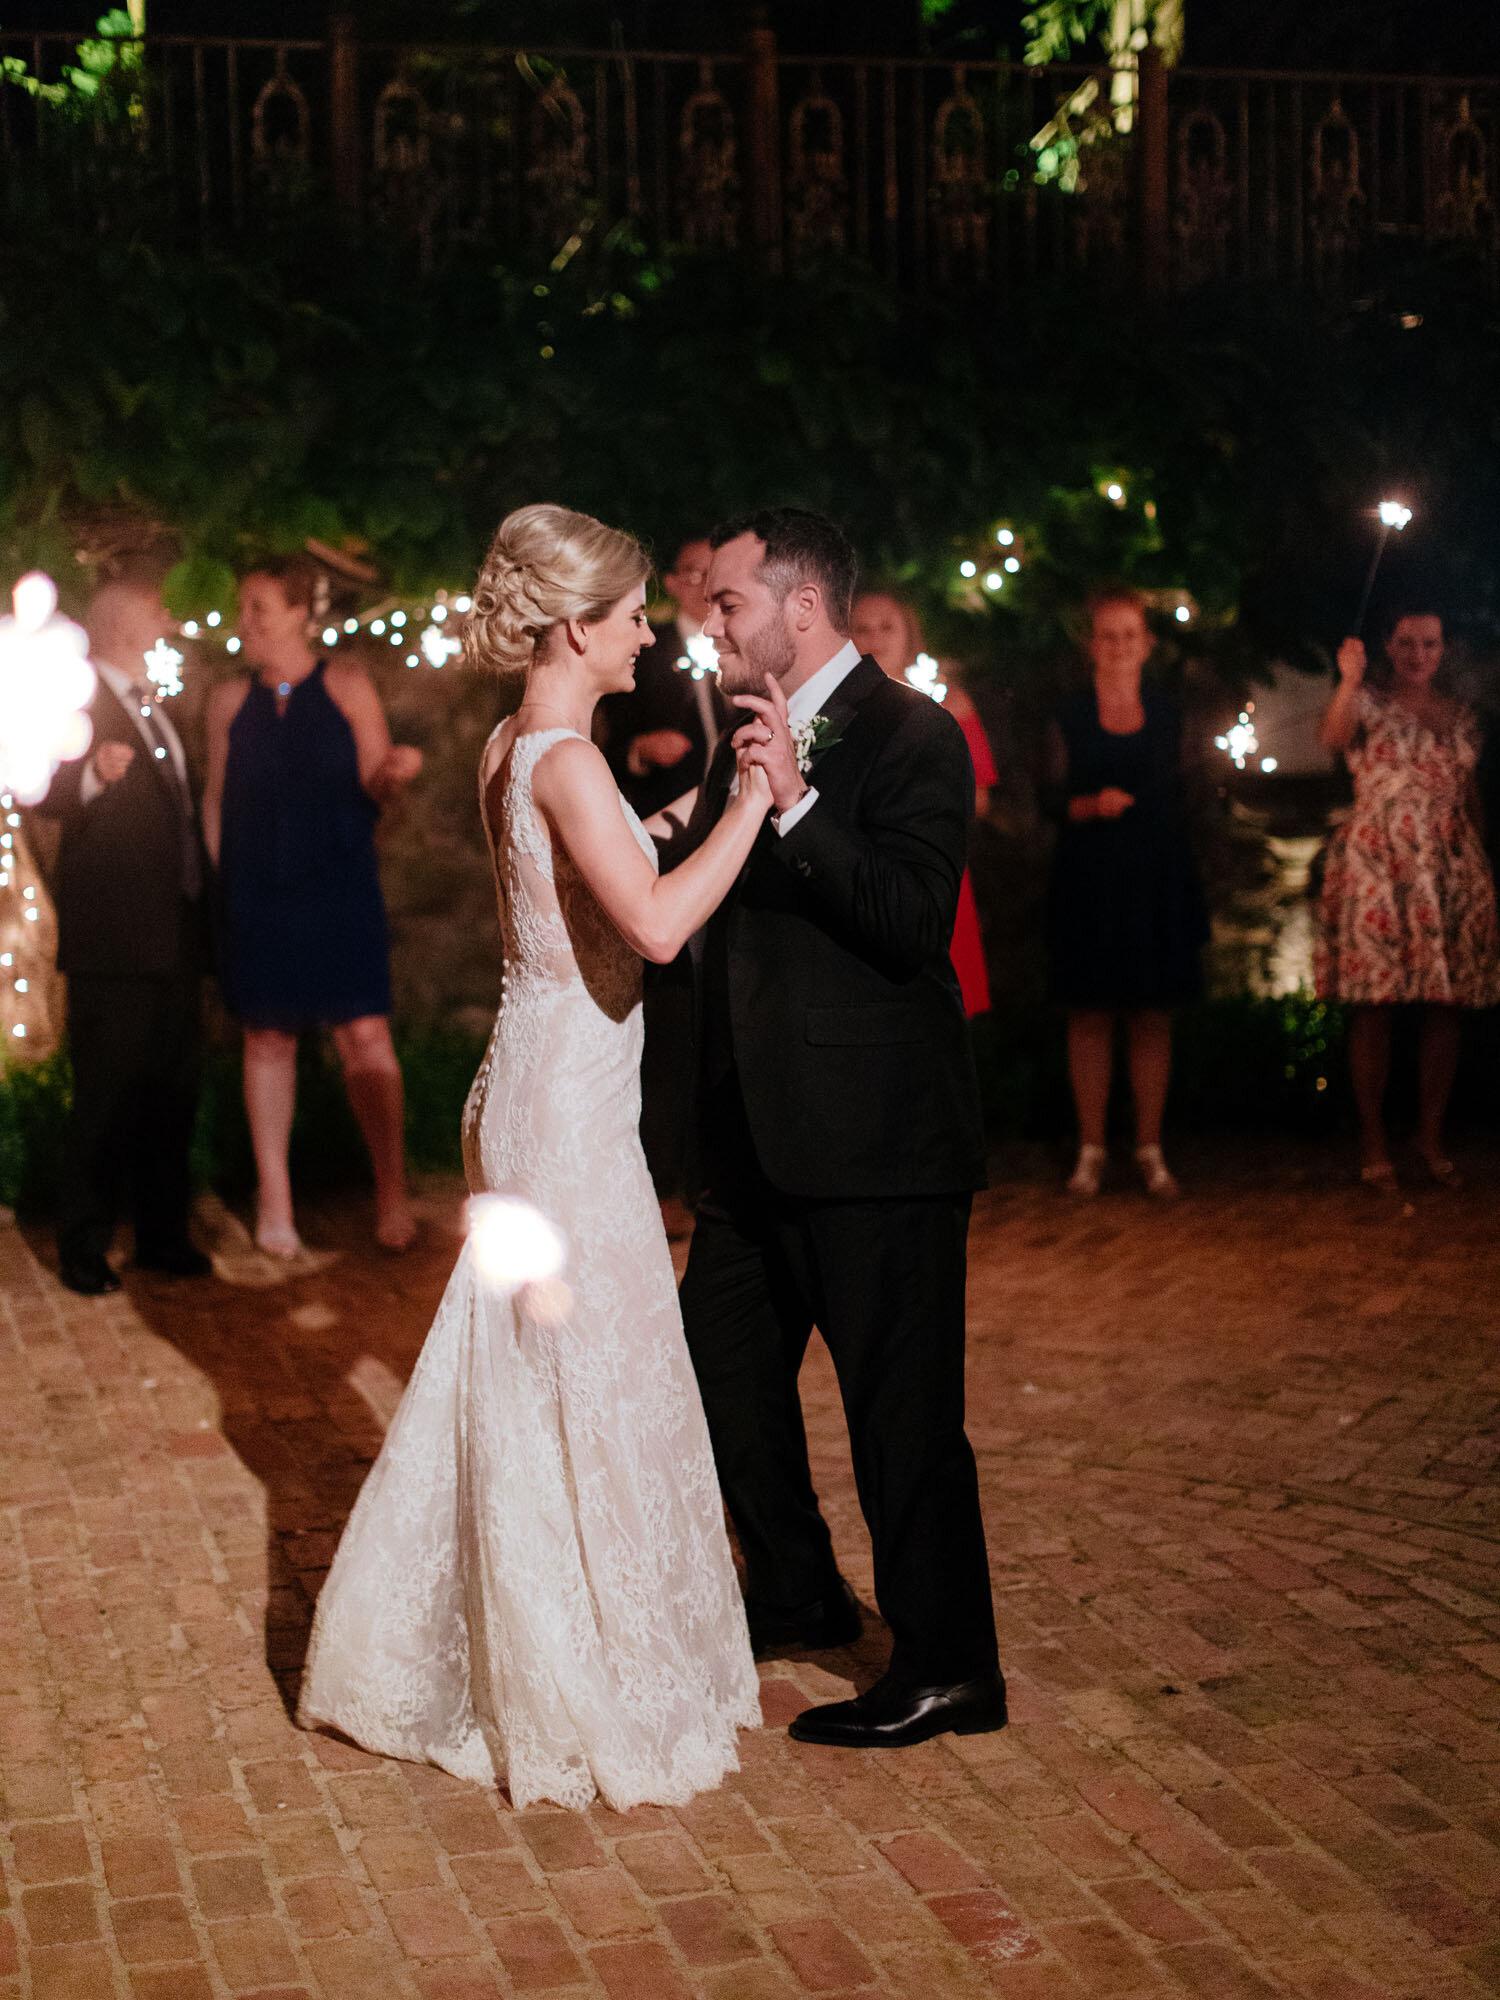 Chris-J-Evans-Maui-Wedding-Kim&Brian4794.jpg